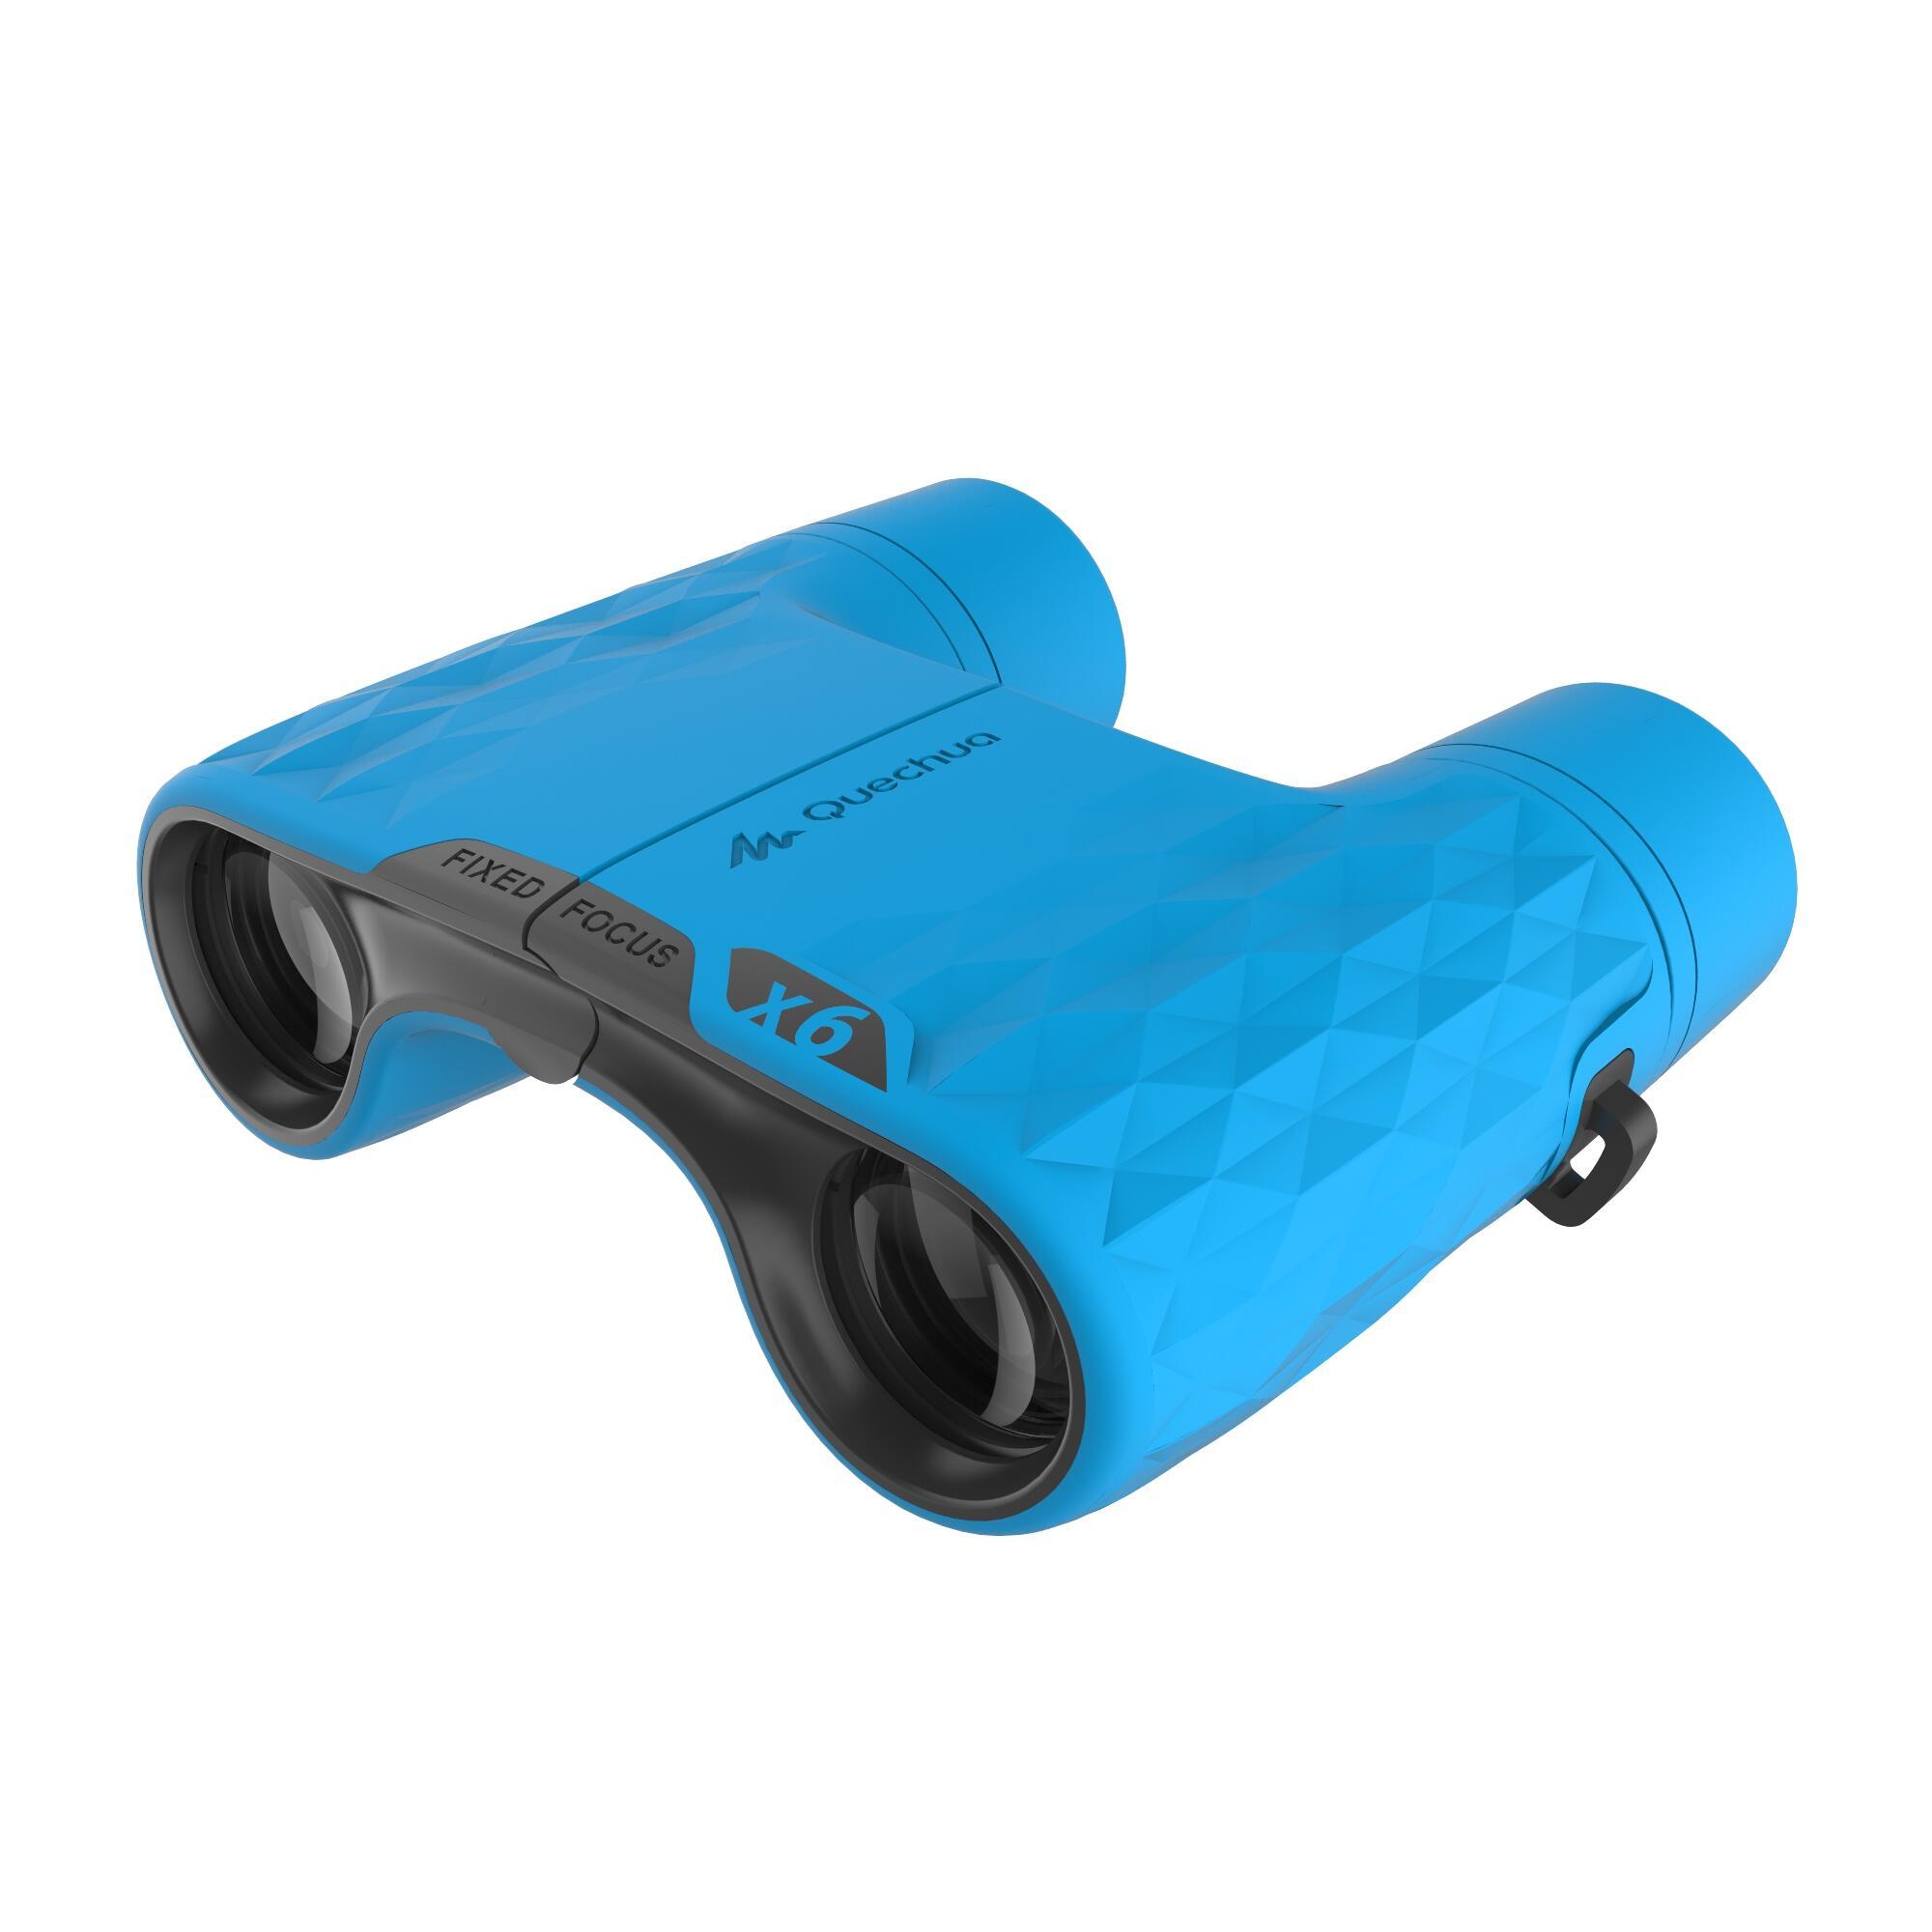 MH B100 Kids' Hiking Binoculars x6 Magnification No Adjustment - Blue